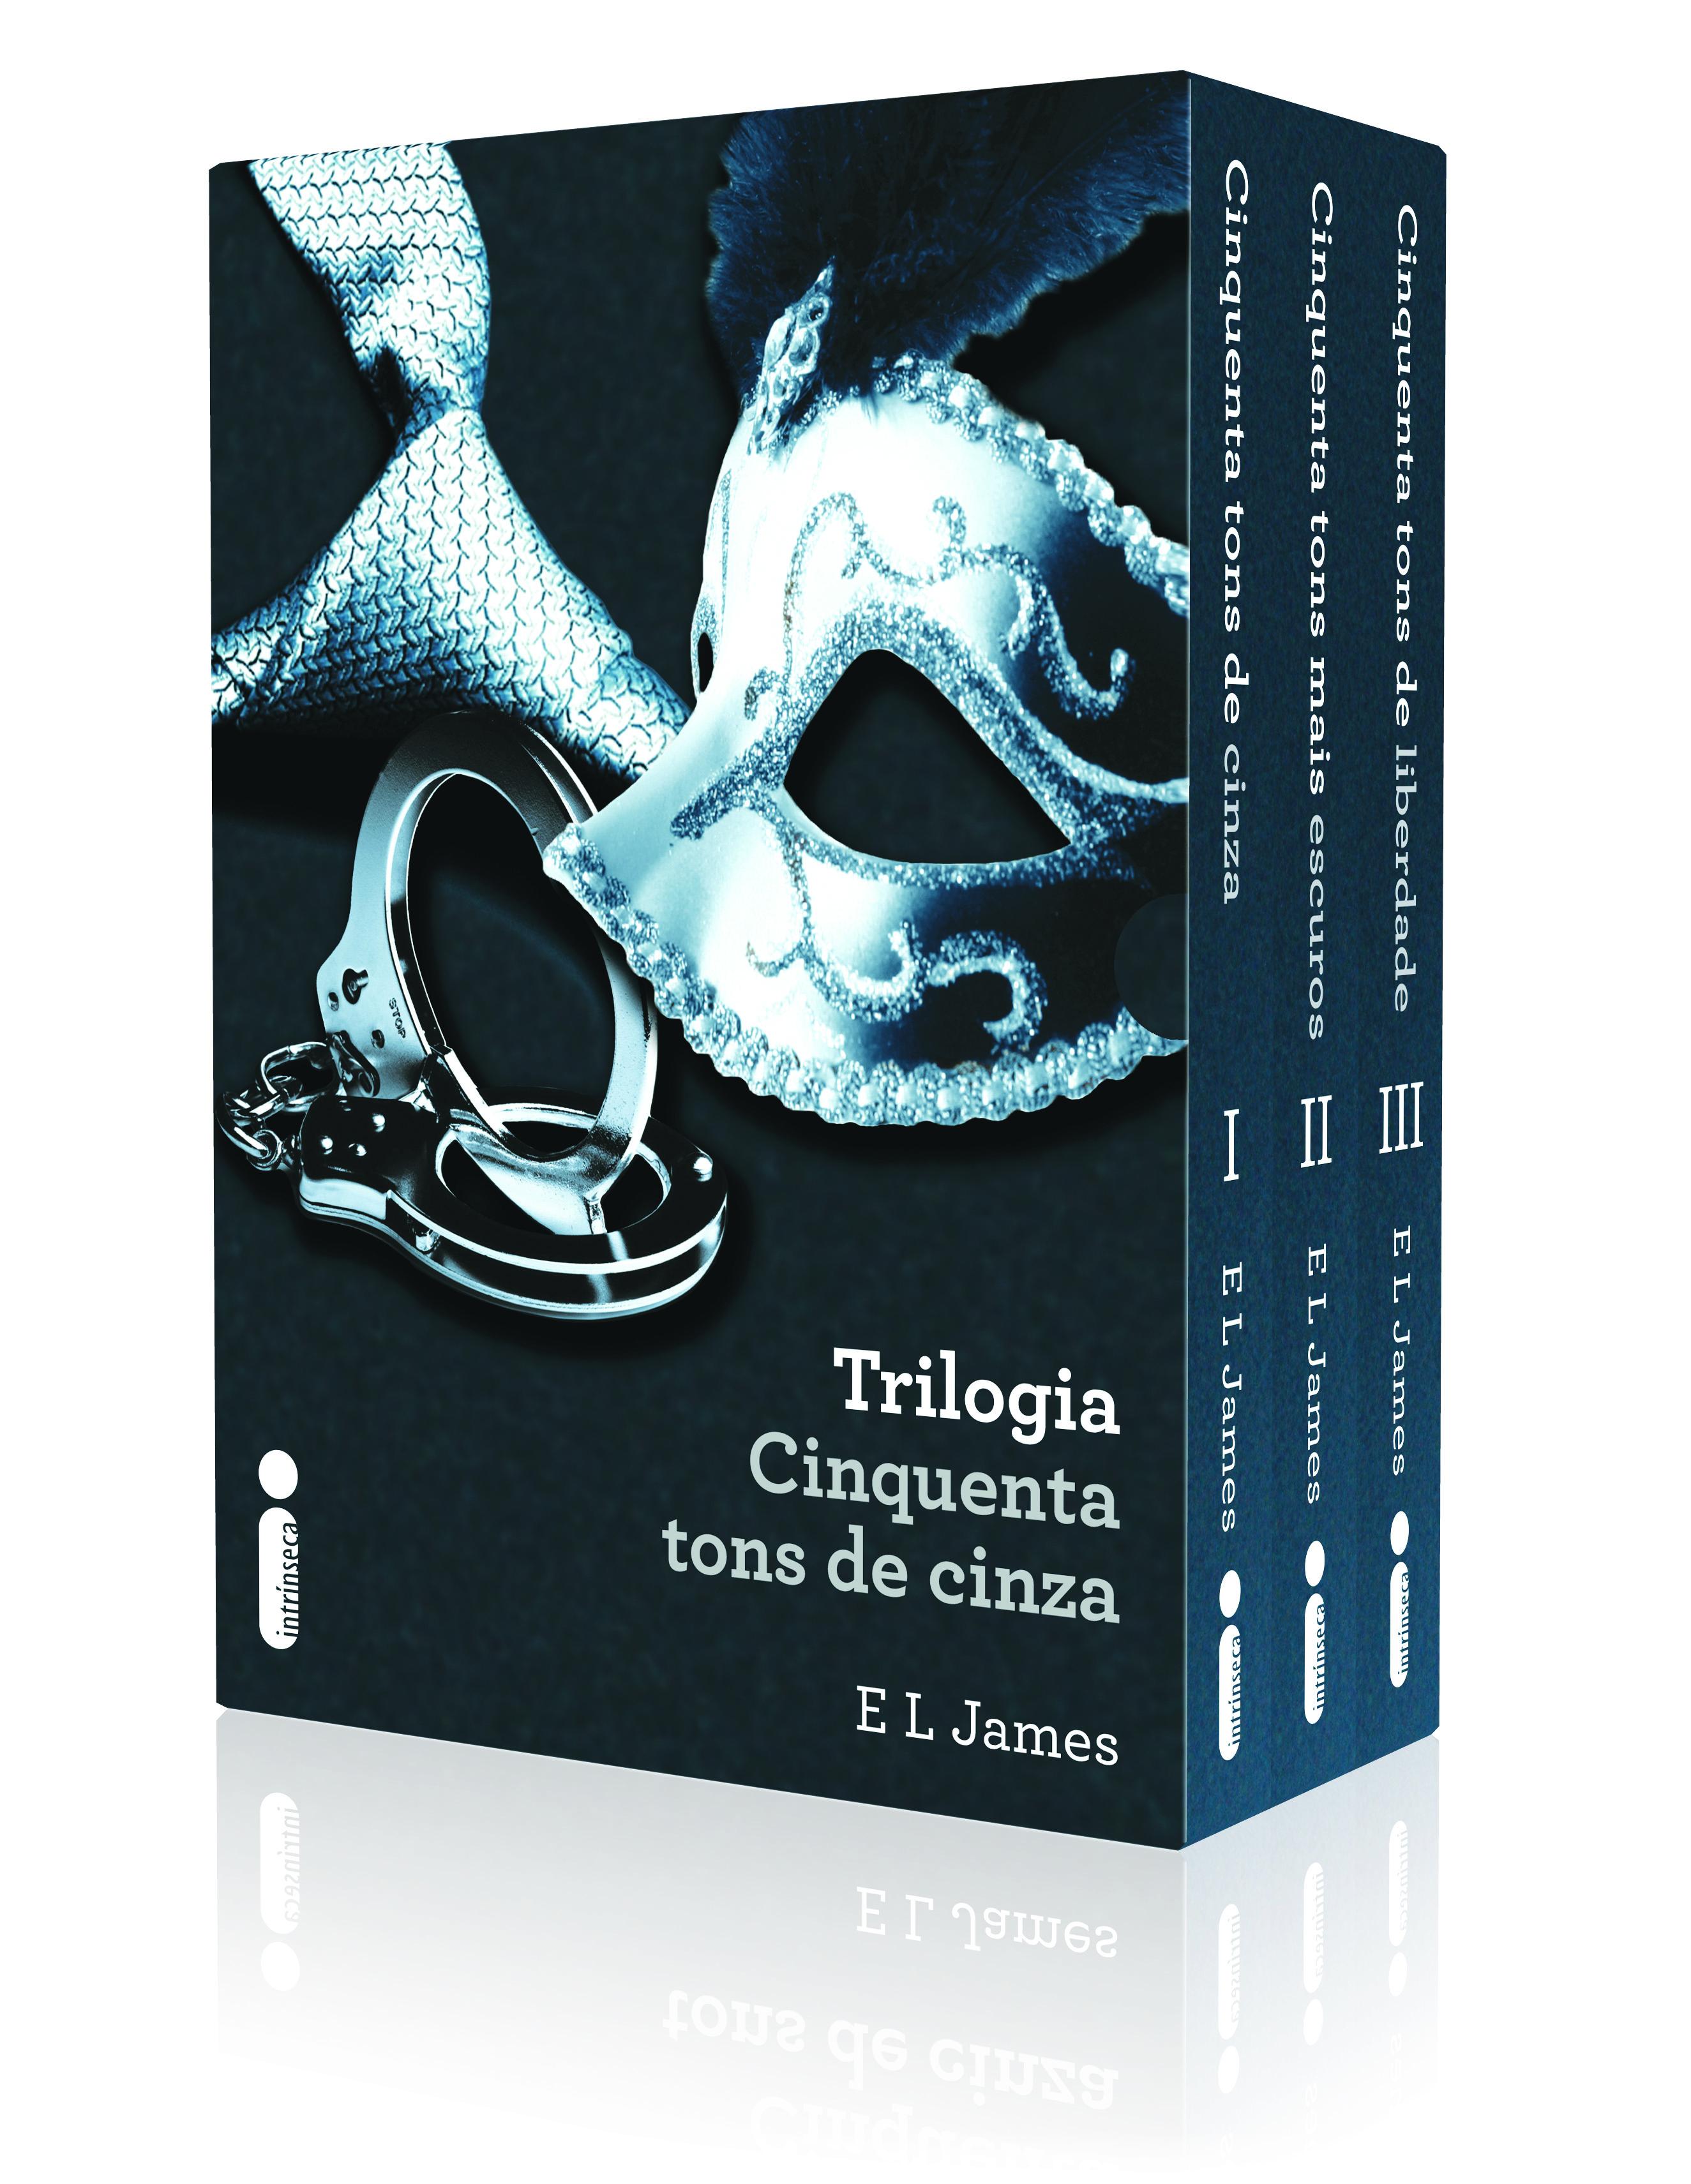 Box da trilogia Cinquenta tons de cinza entra em pré-venda